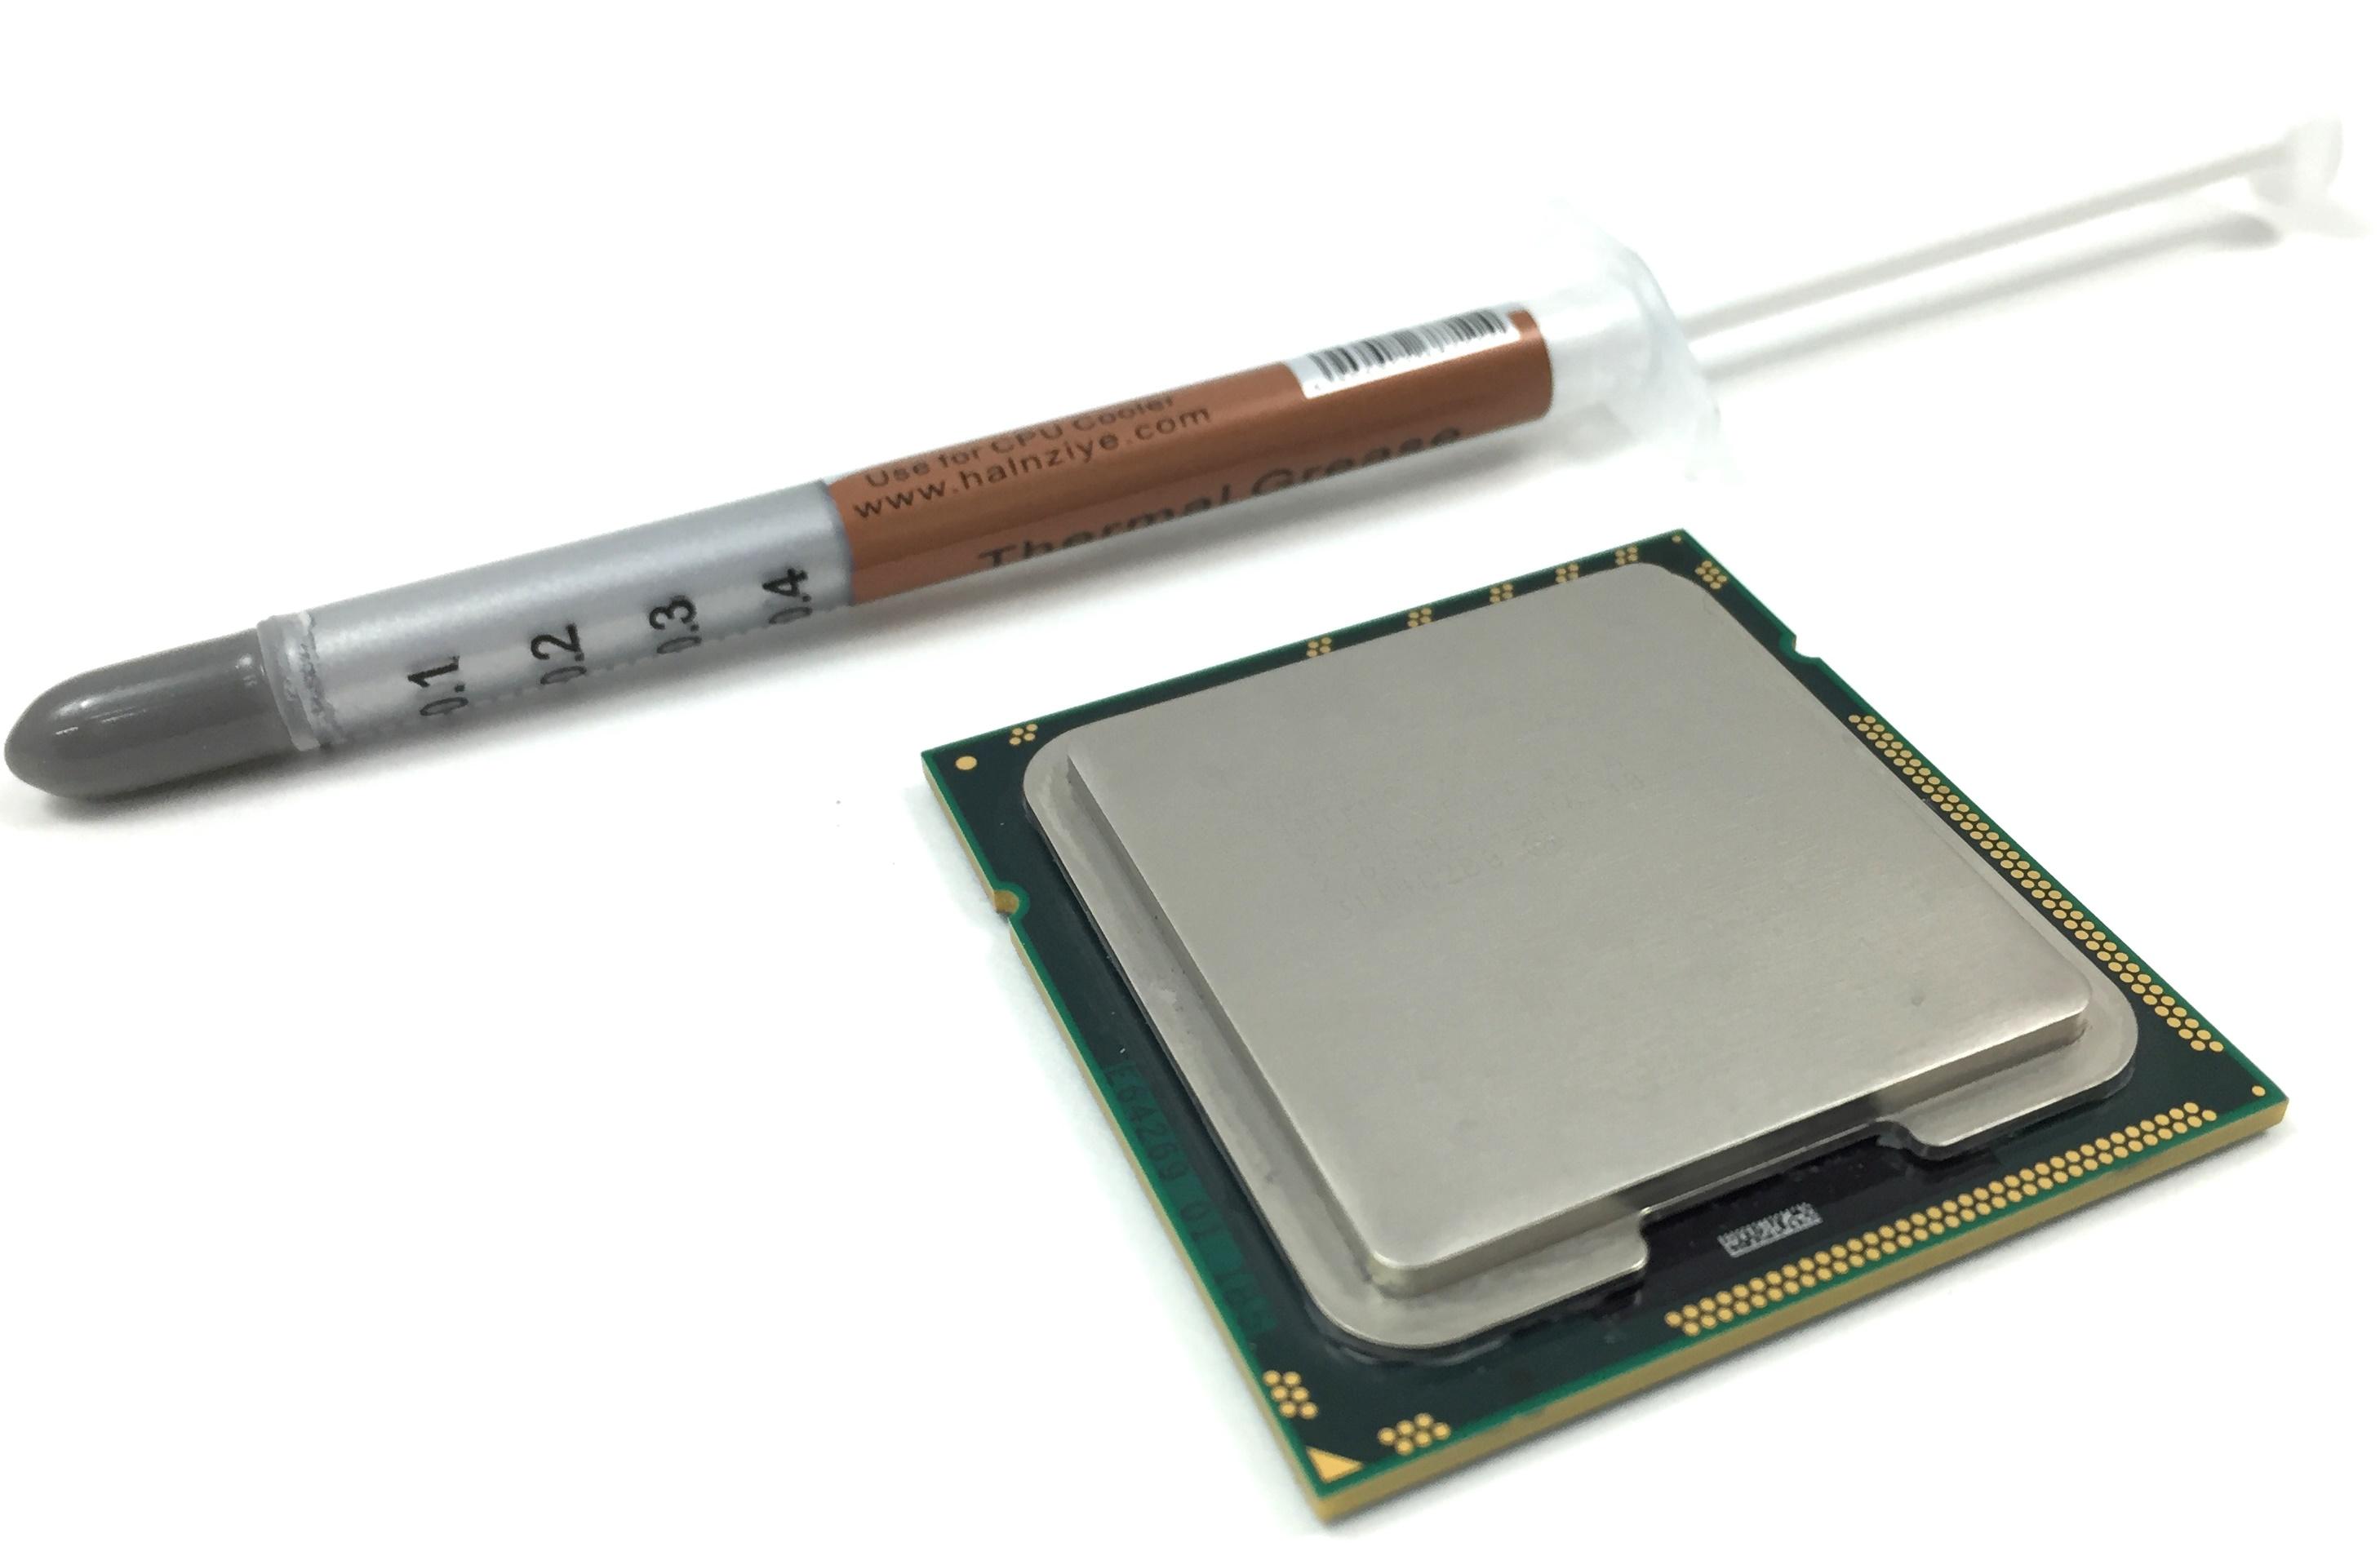 INTEL XEON E5-2440 2.40GHZ 6 CORE 15MB 95W LGA1356 PROCESSOR (SR0LK)